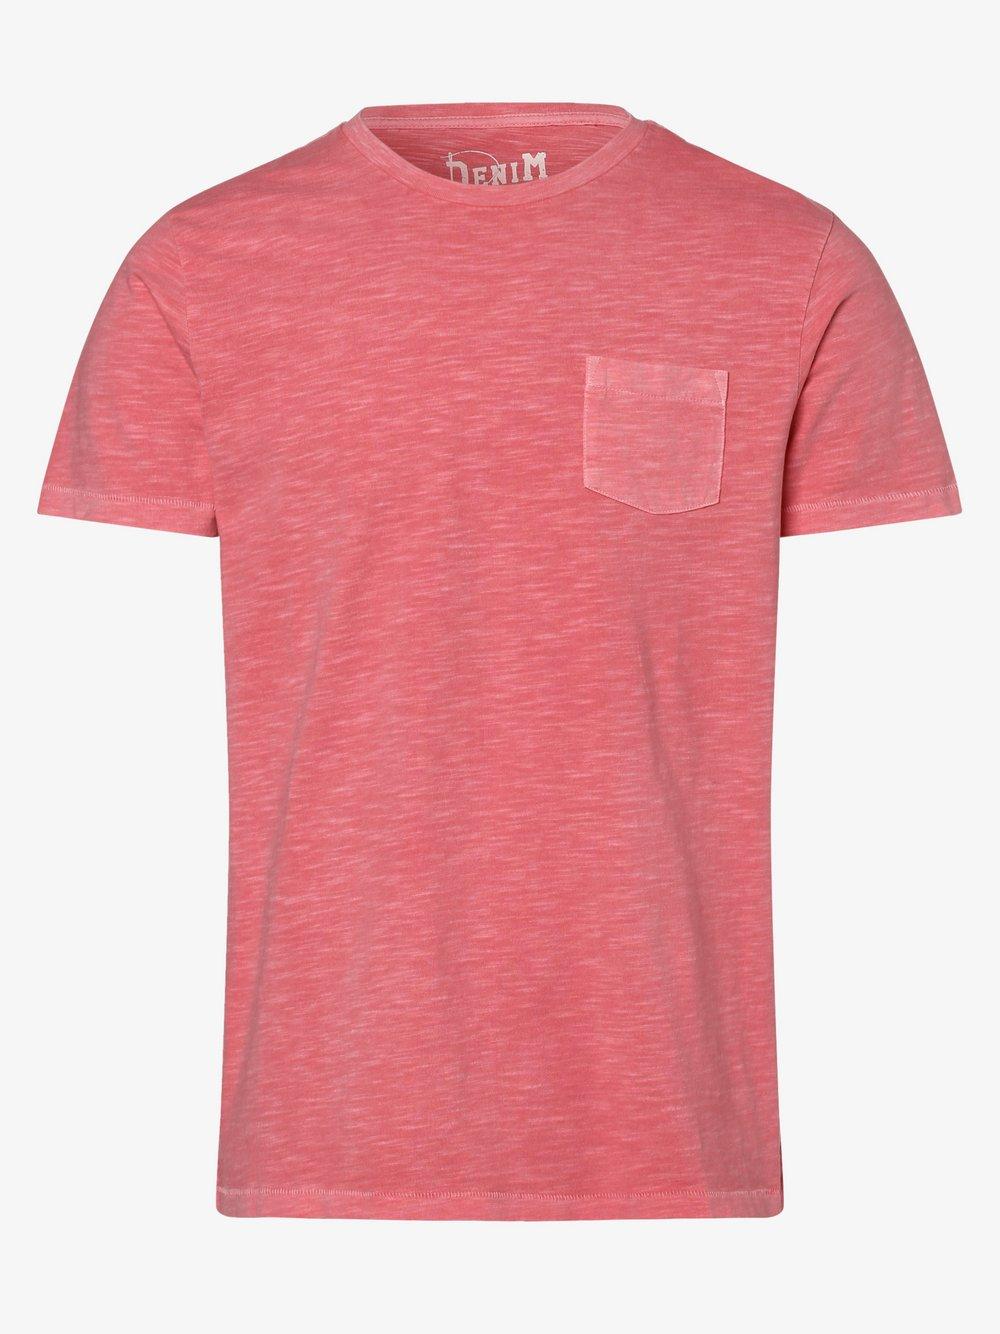 DENIM by Nils Sundström – T-shirt męski, różowy Van Graaf 472196-0009-09995